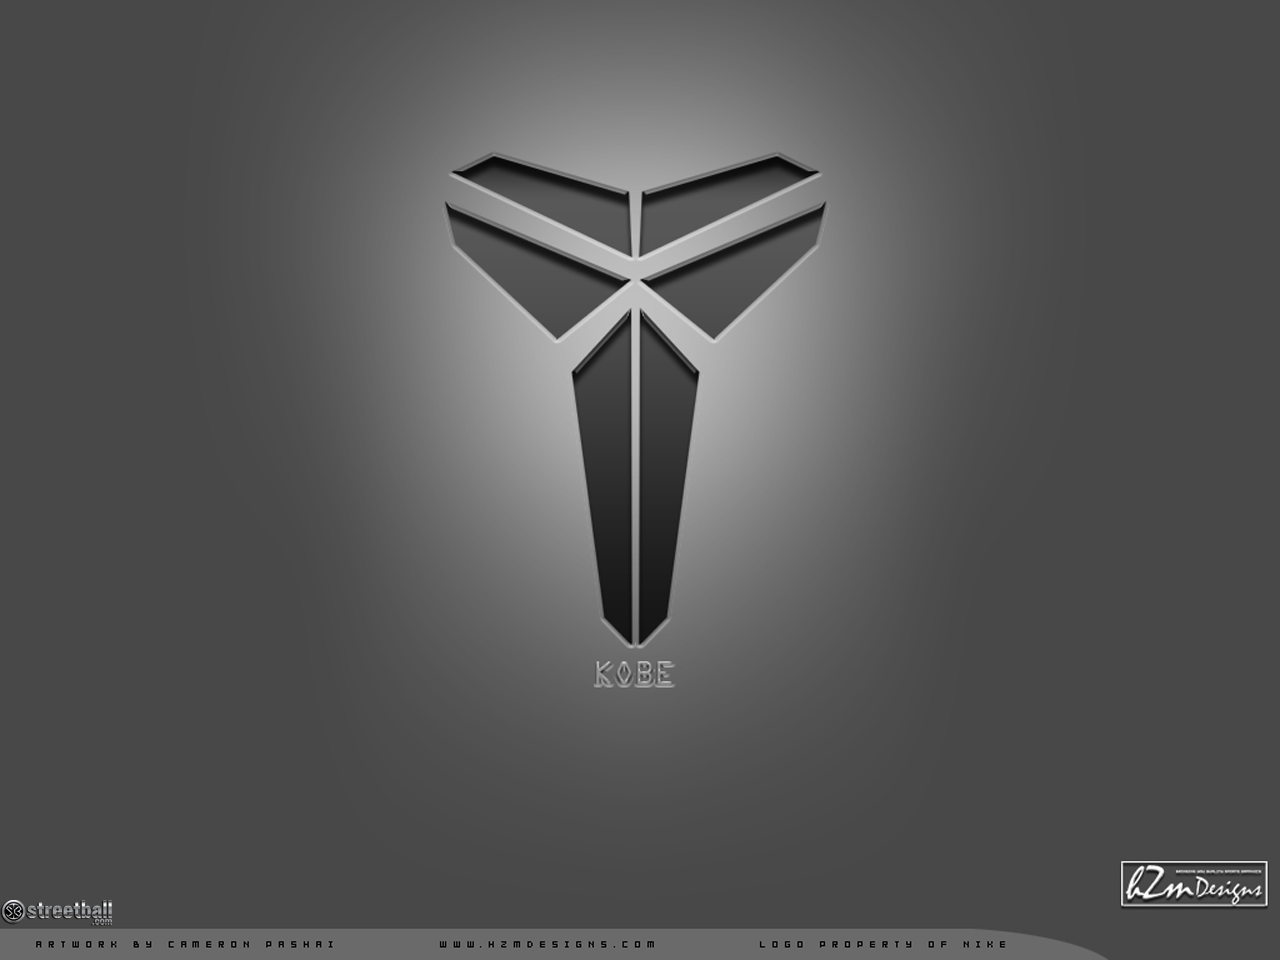 Nike Kobe Wallpapers 1280x960